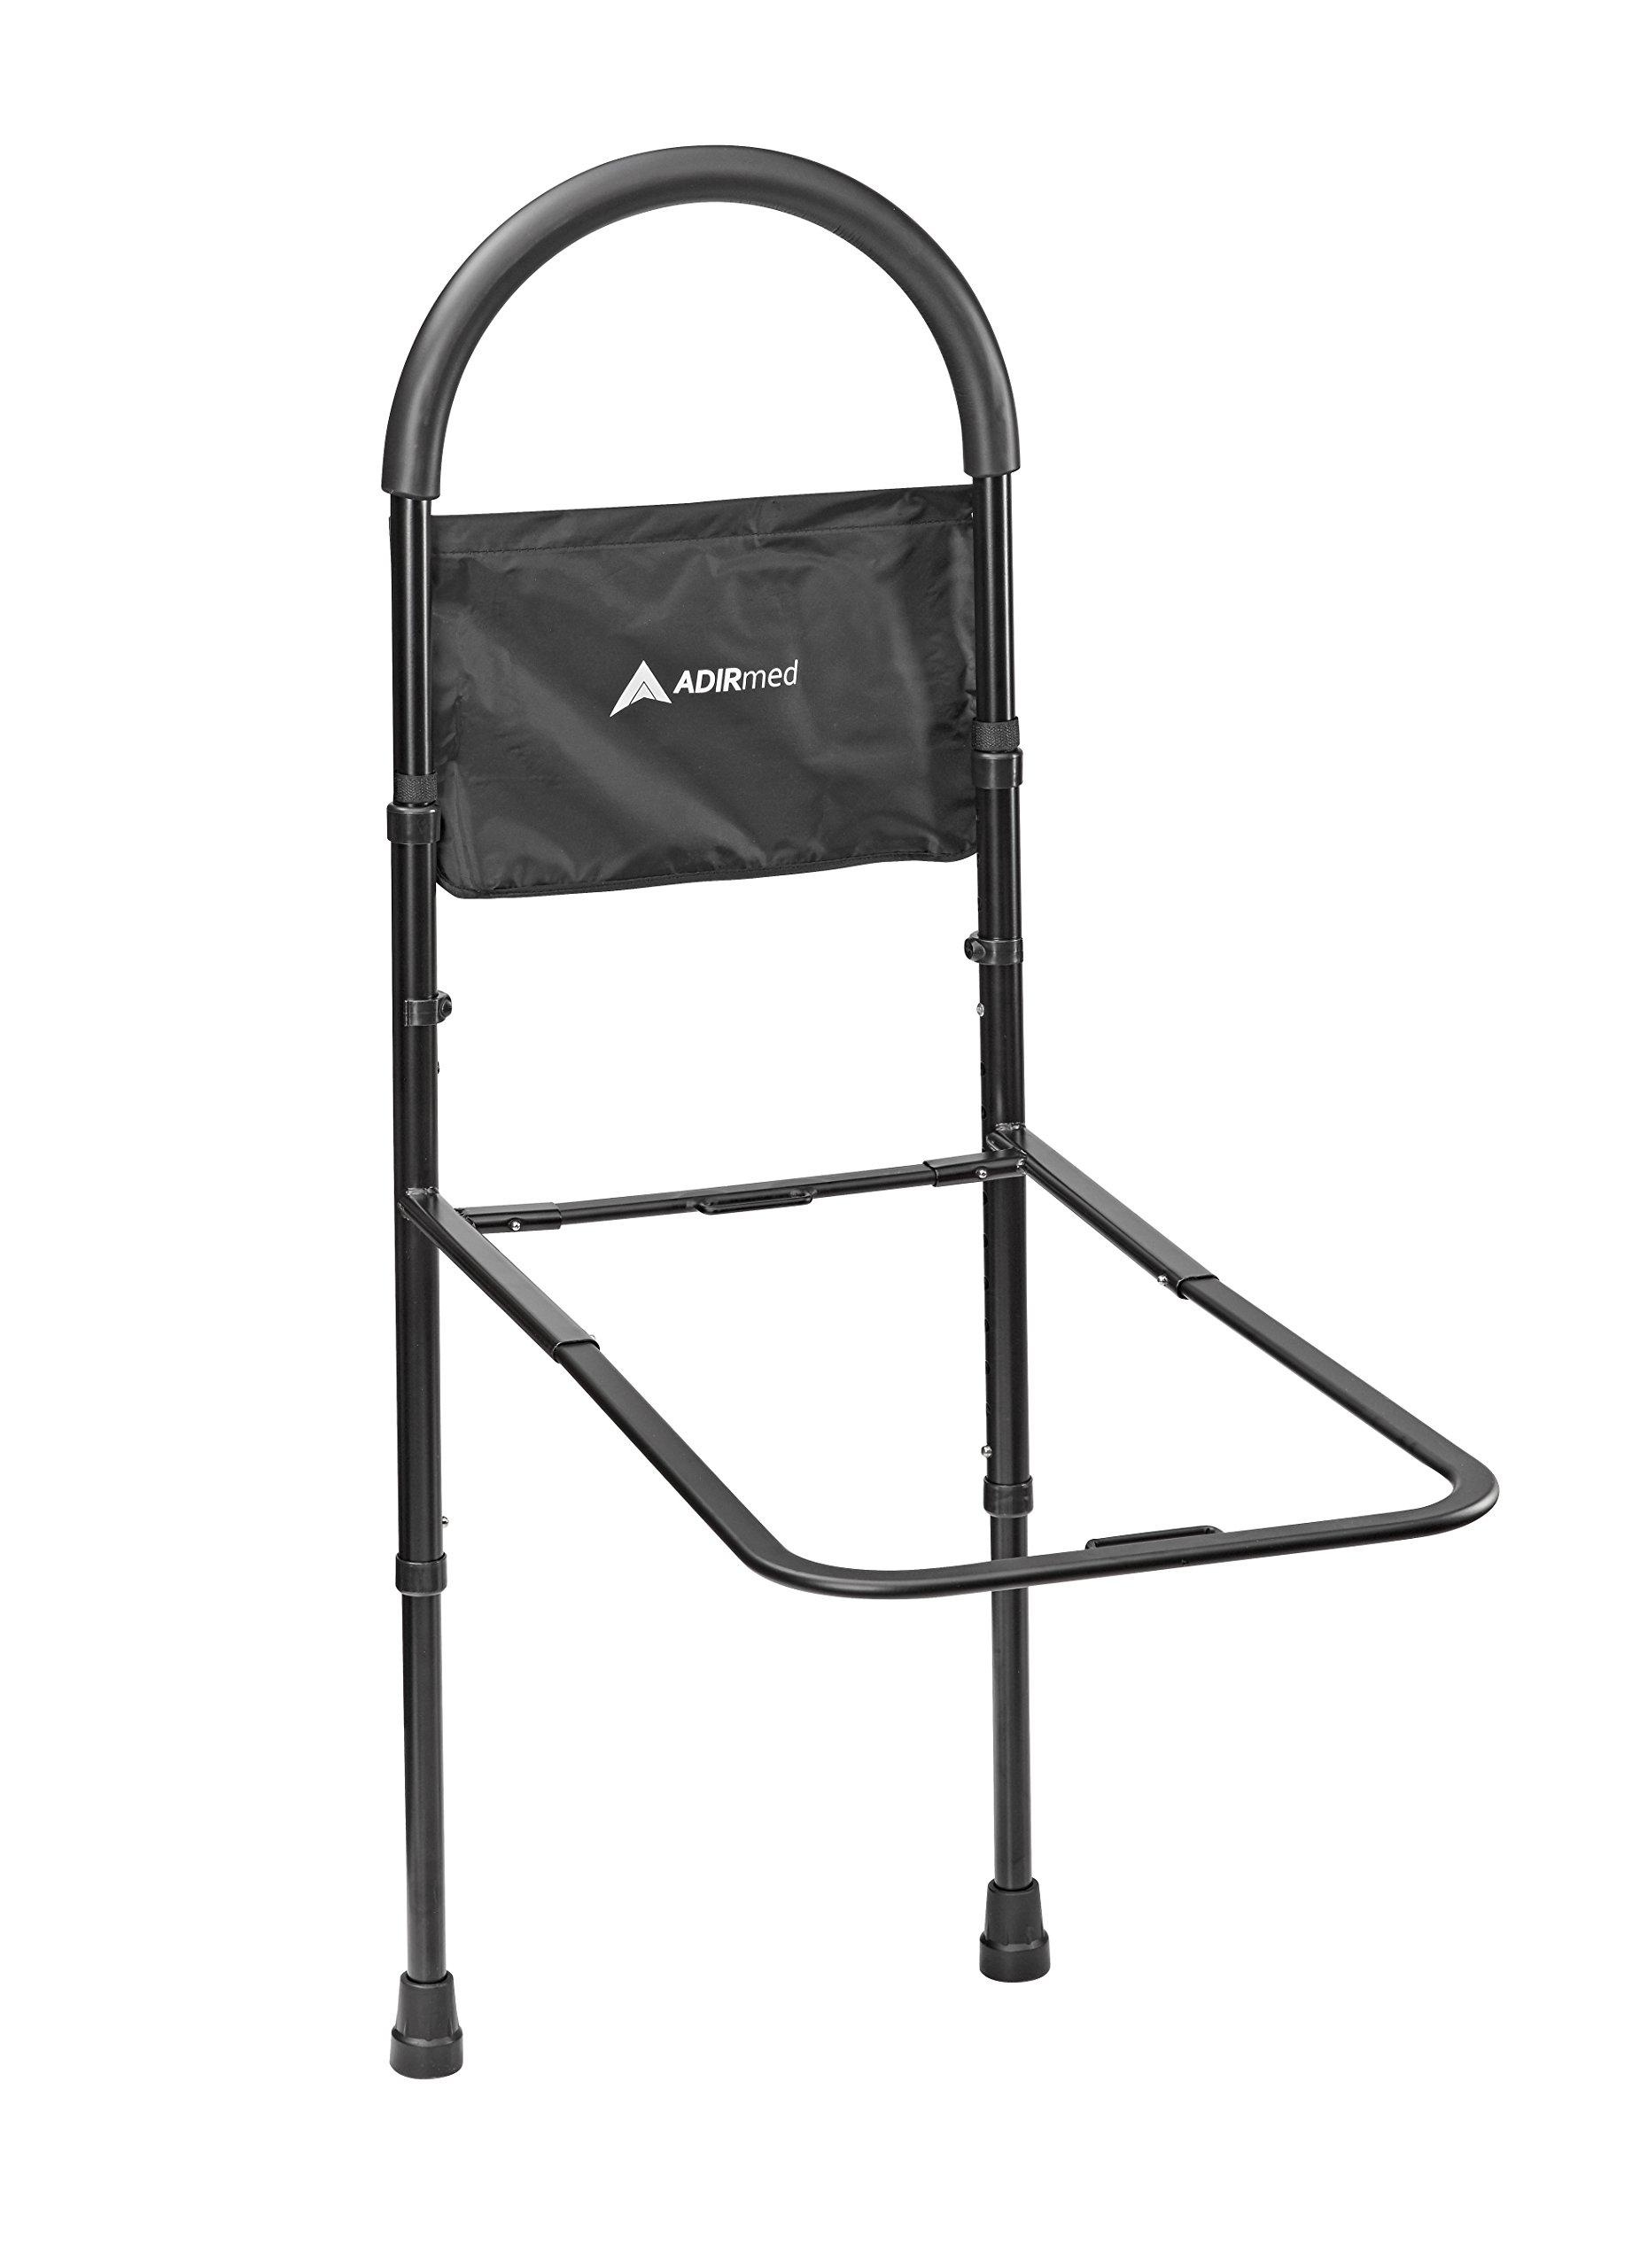 Adirmed Height Adjustable Bed Rail Bed Assist Handle